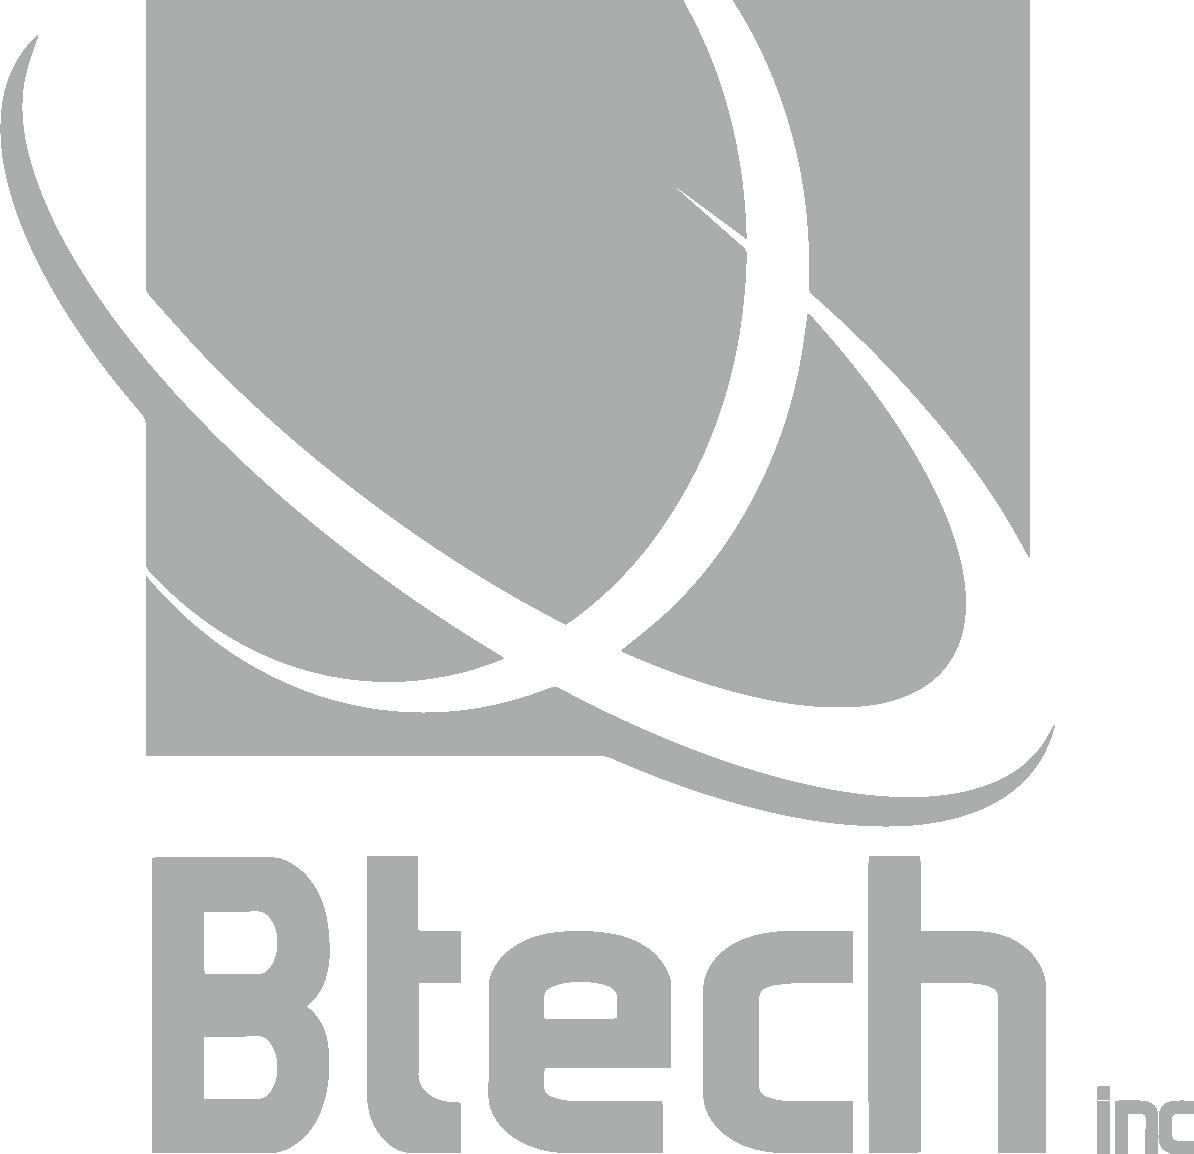 BTECH, Inc.